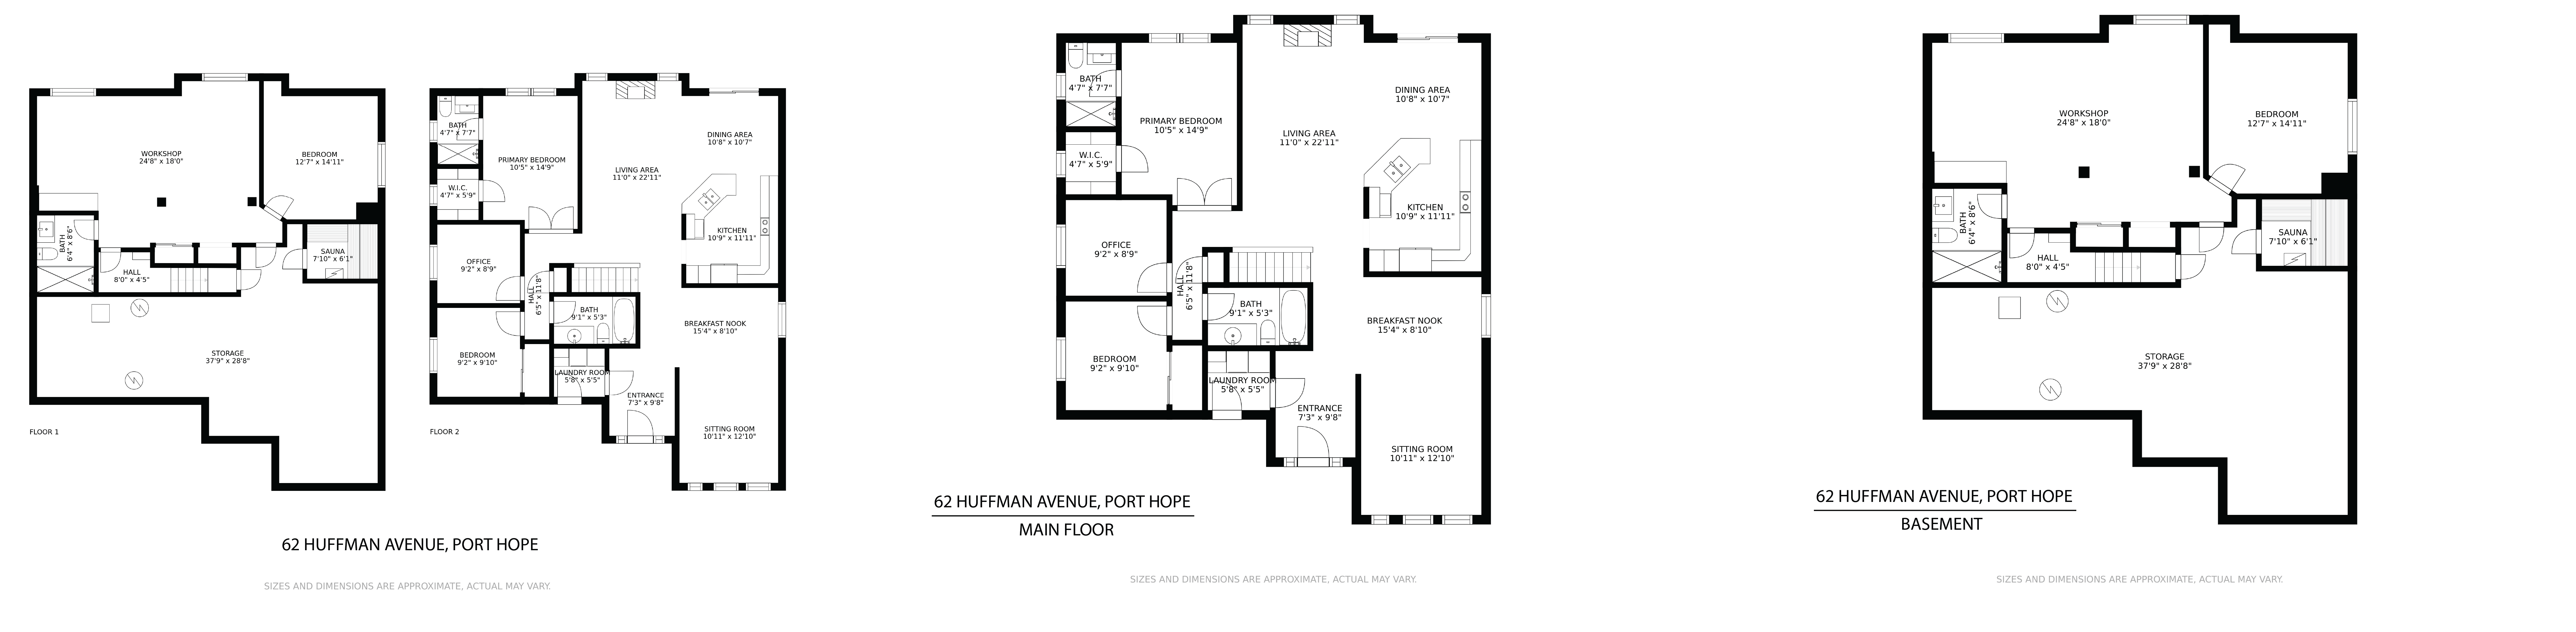 62 Huffman Avenue floorplan